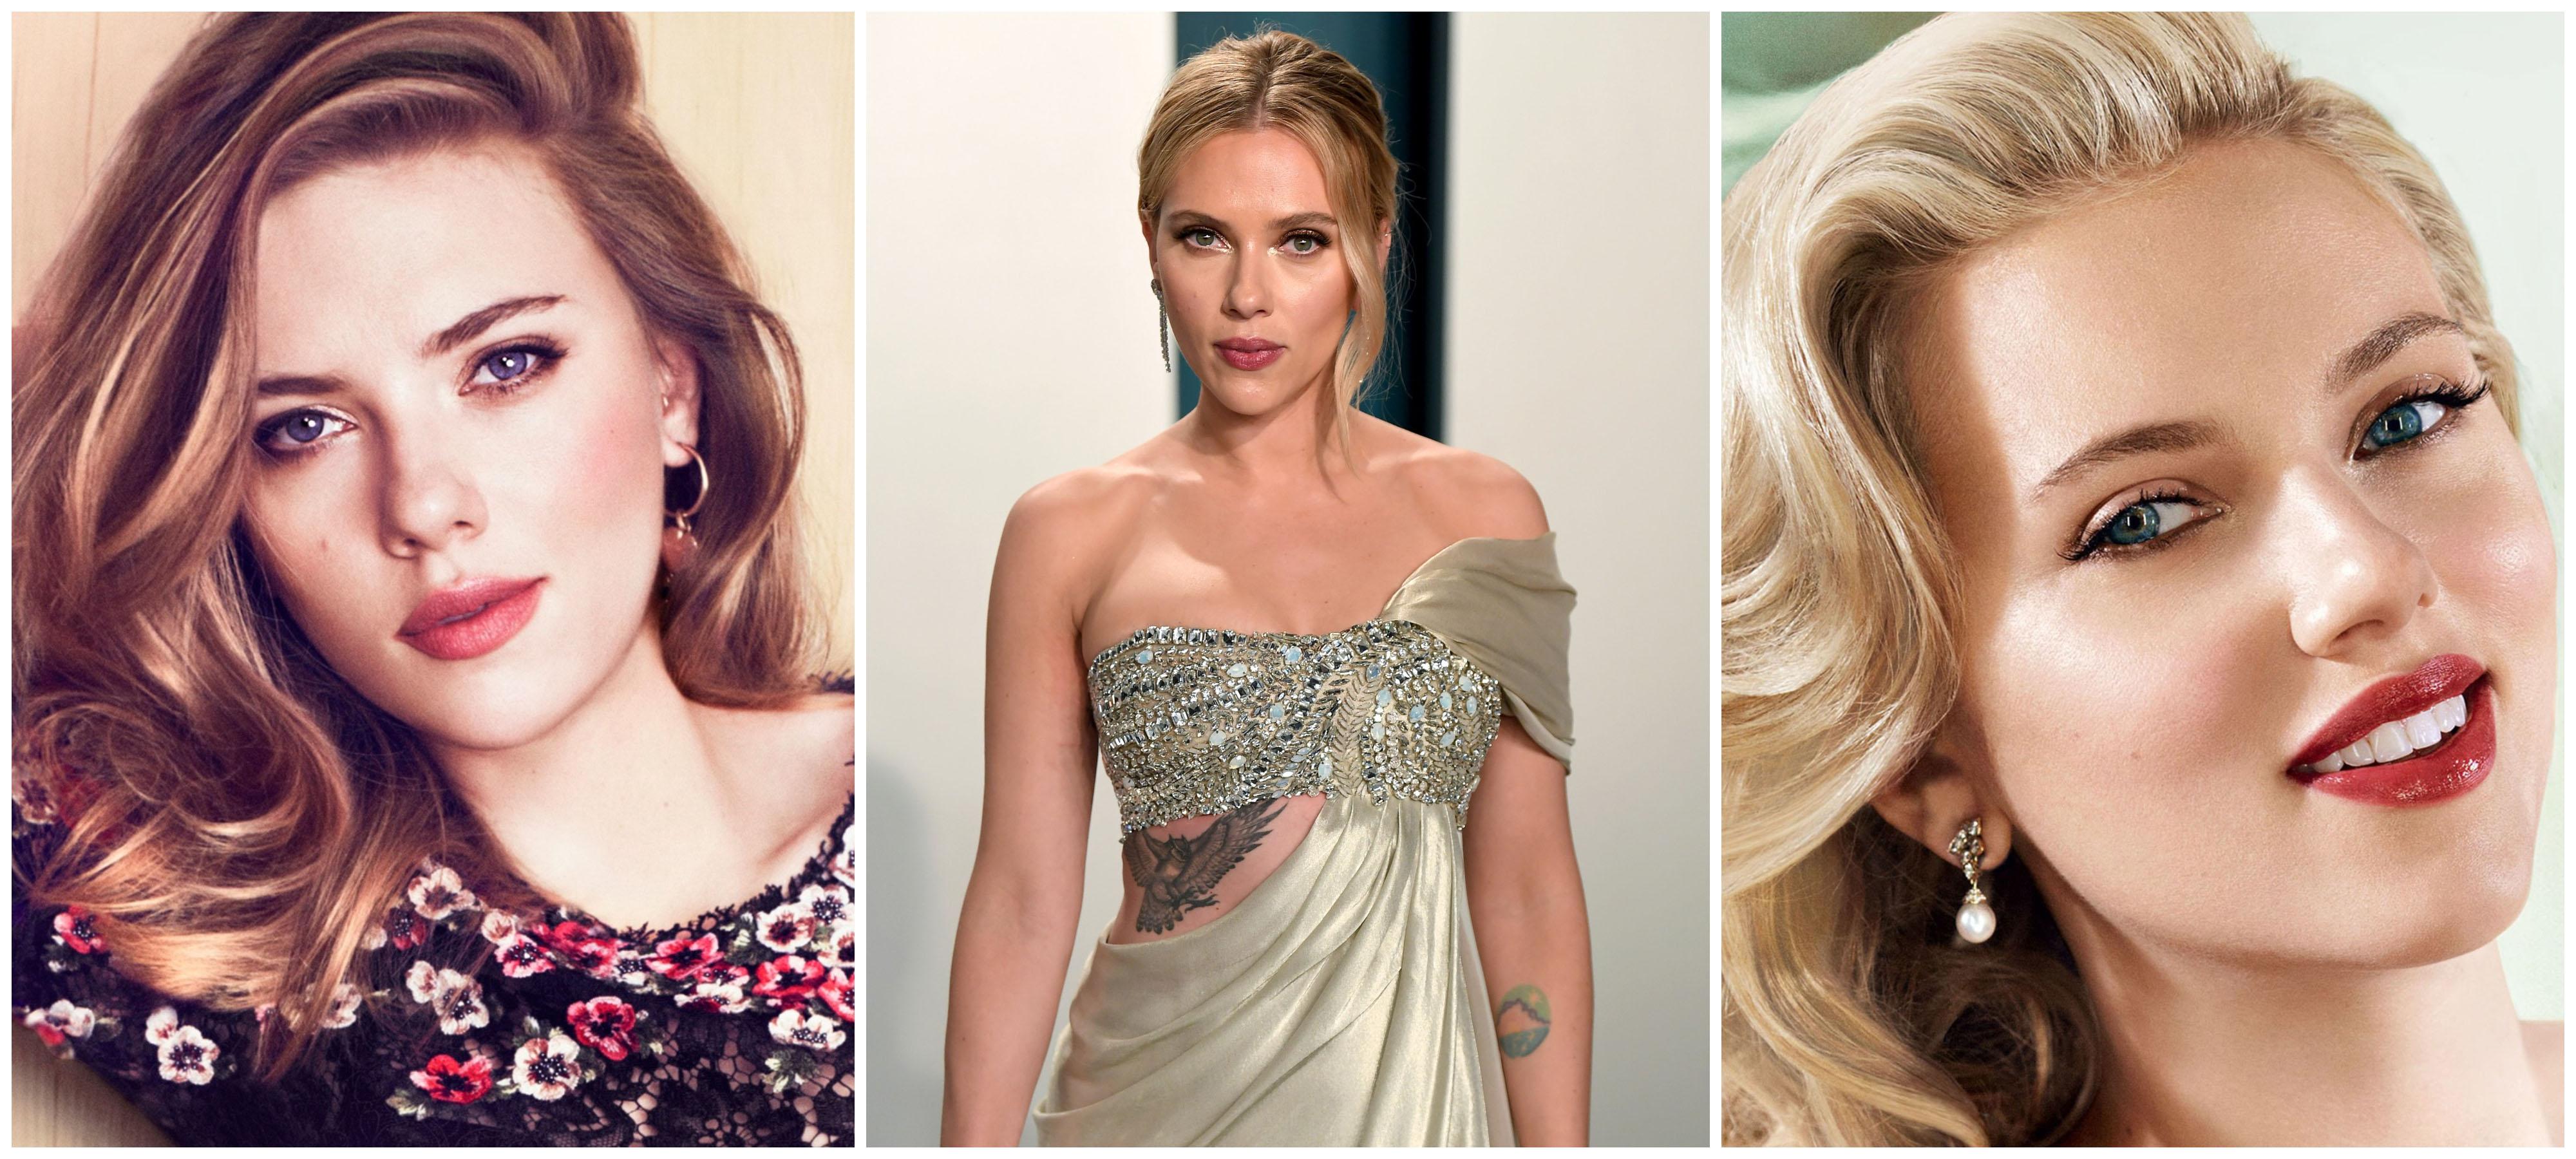 Scarlett Johansson Kolaj (3'lü).jpg